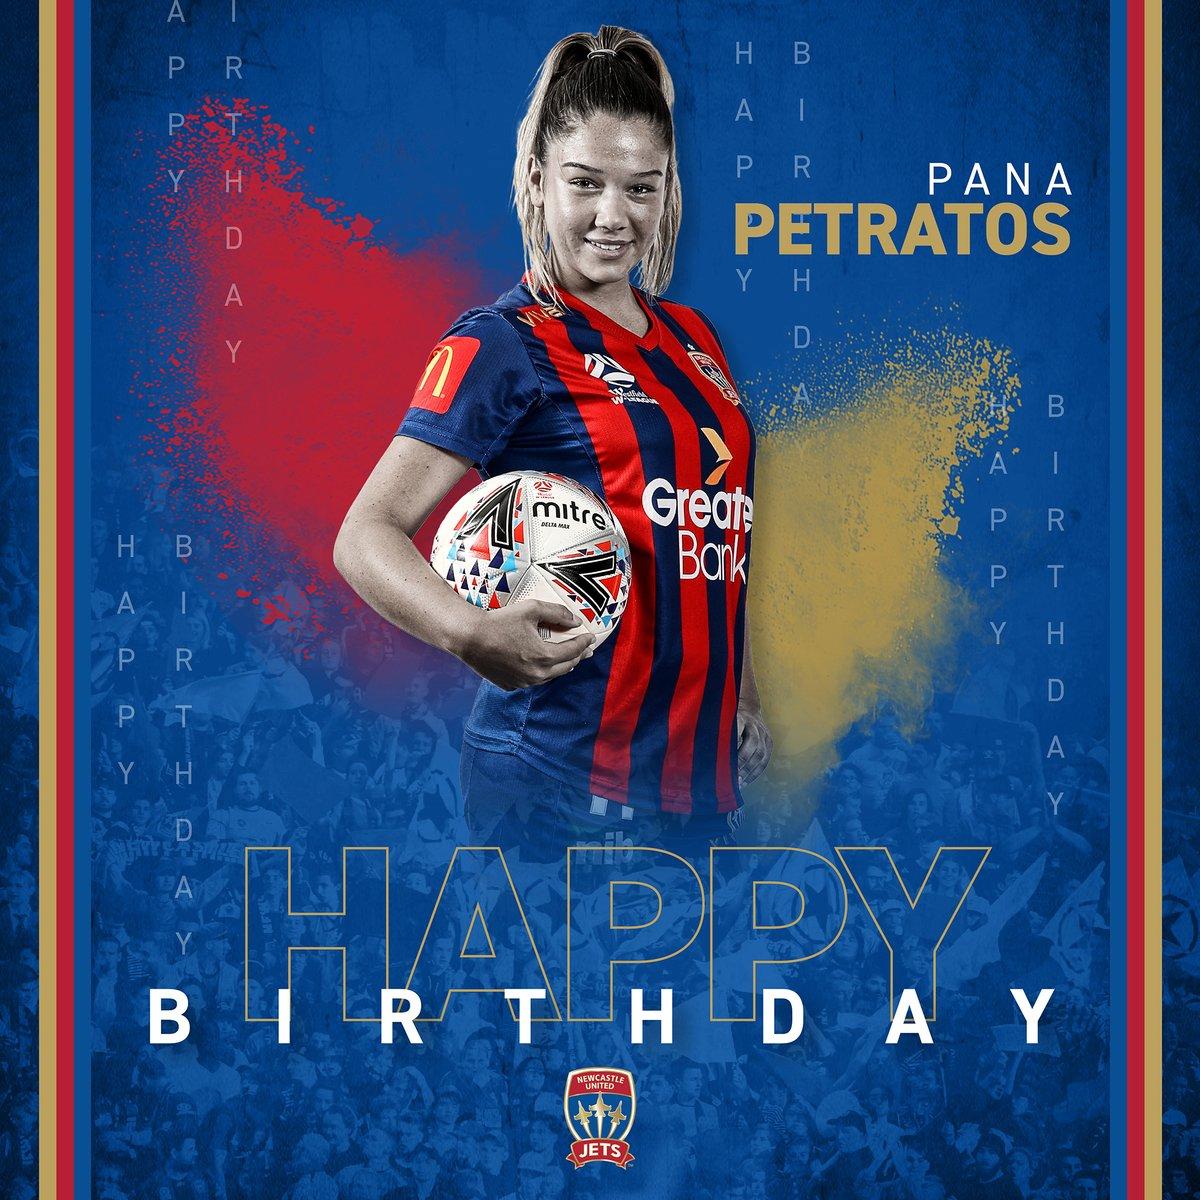 Happy birthday, Pana! #MadeOfNewcastle https://t.co/fBC0Qarz4e